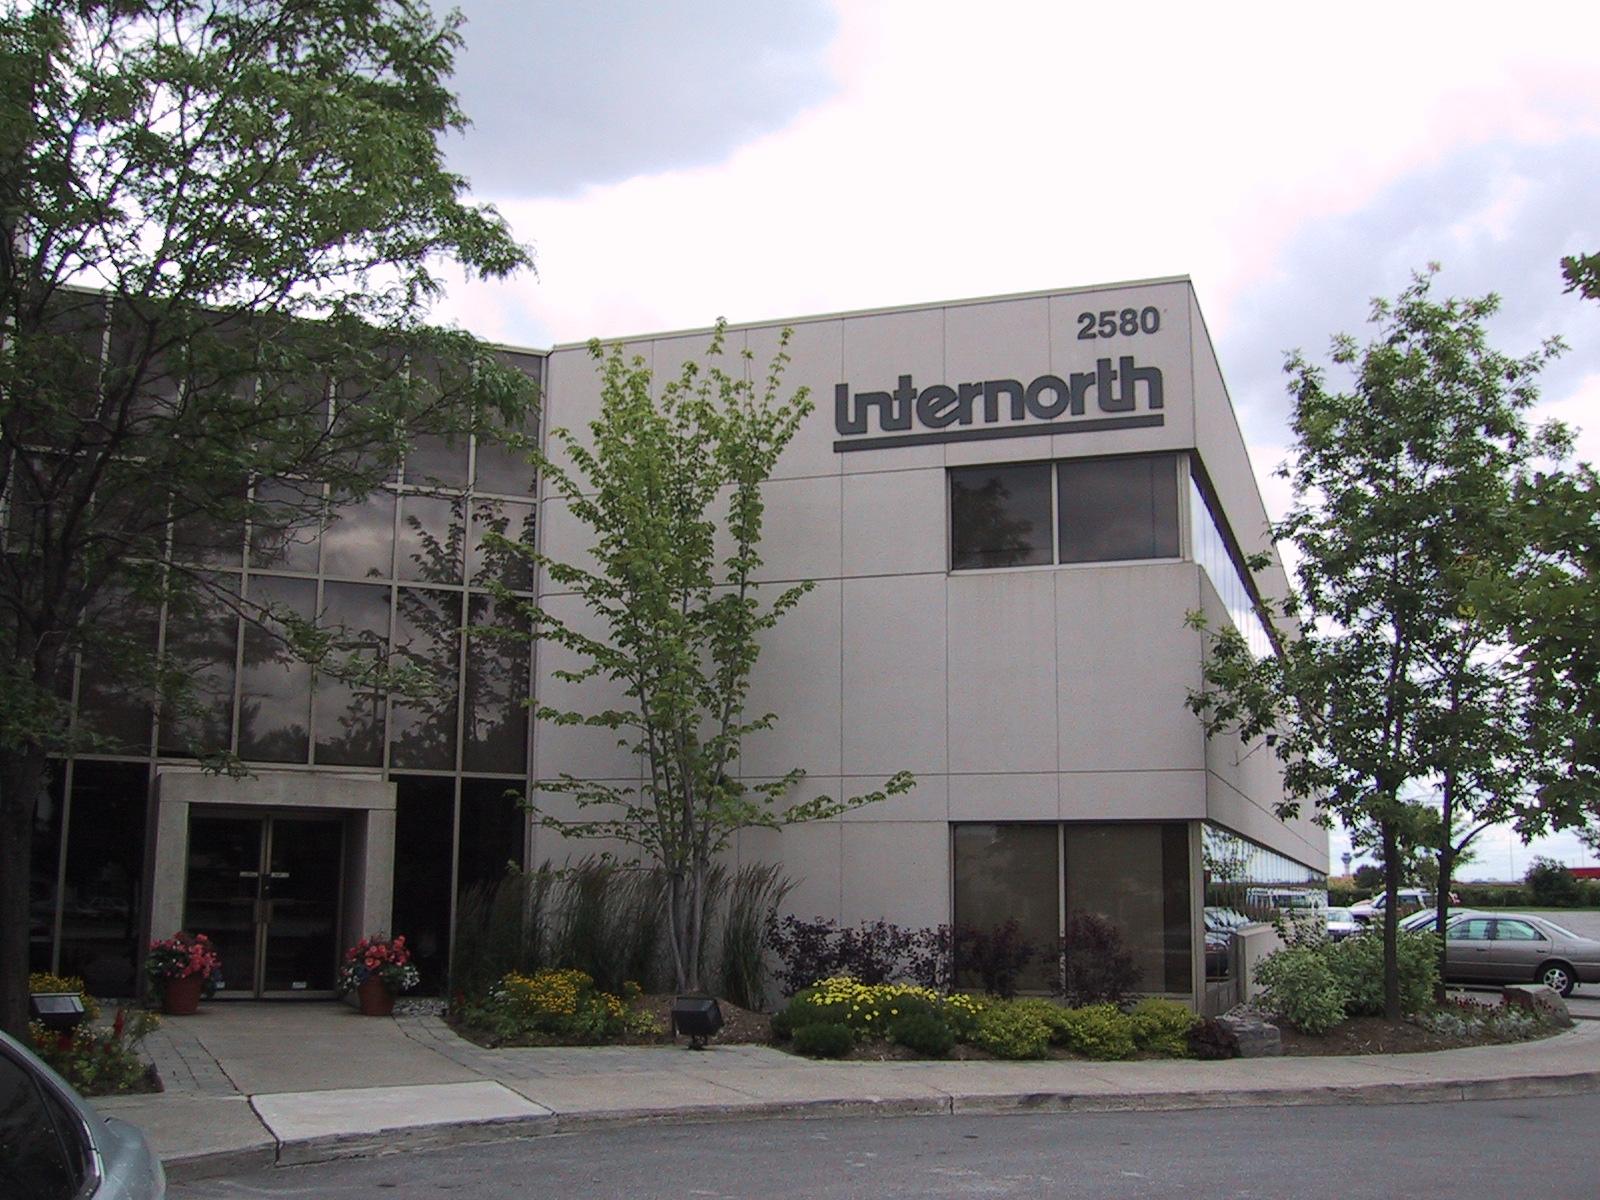 Intenorth buliding